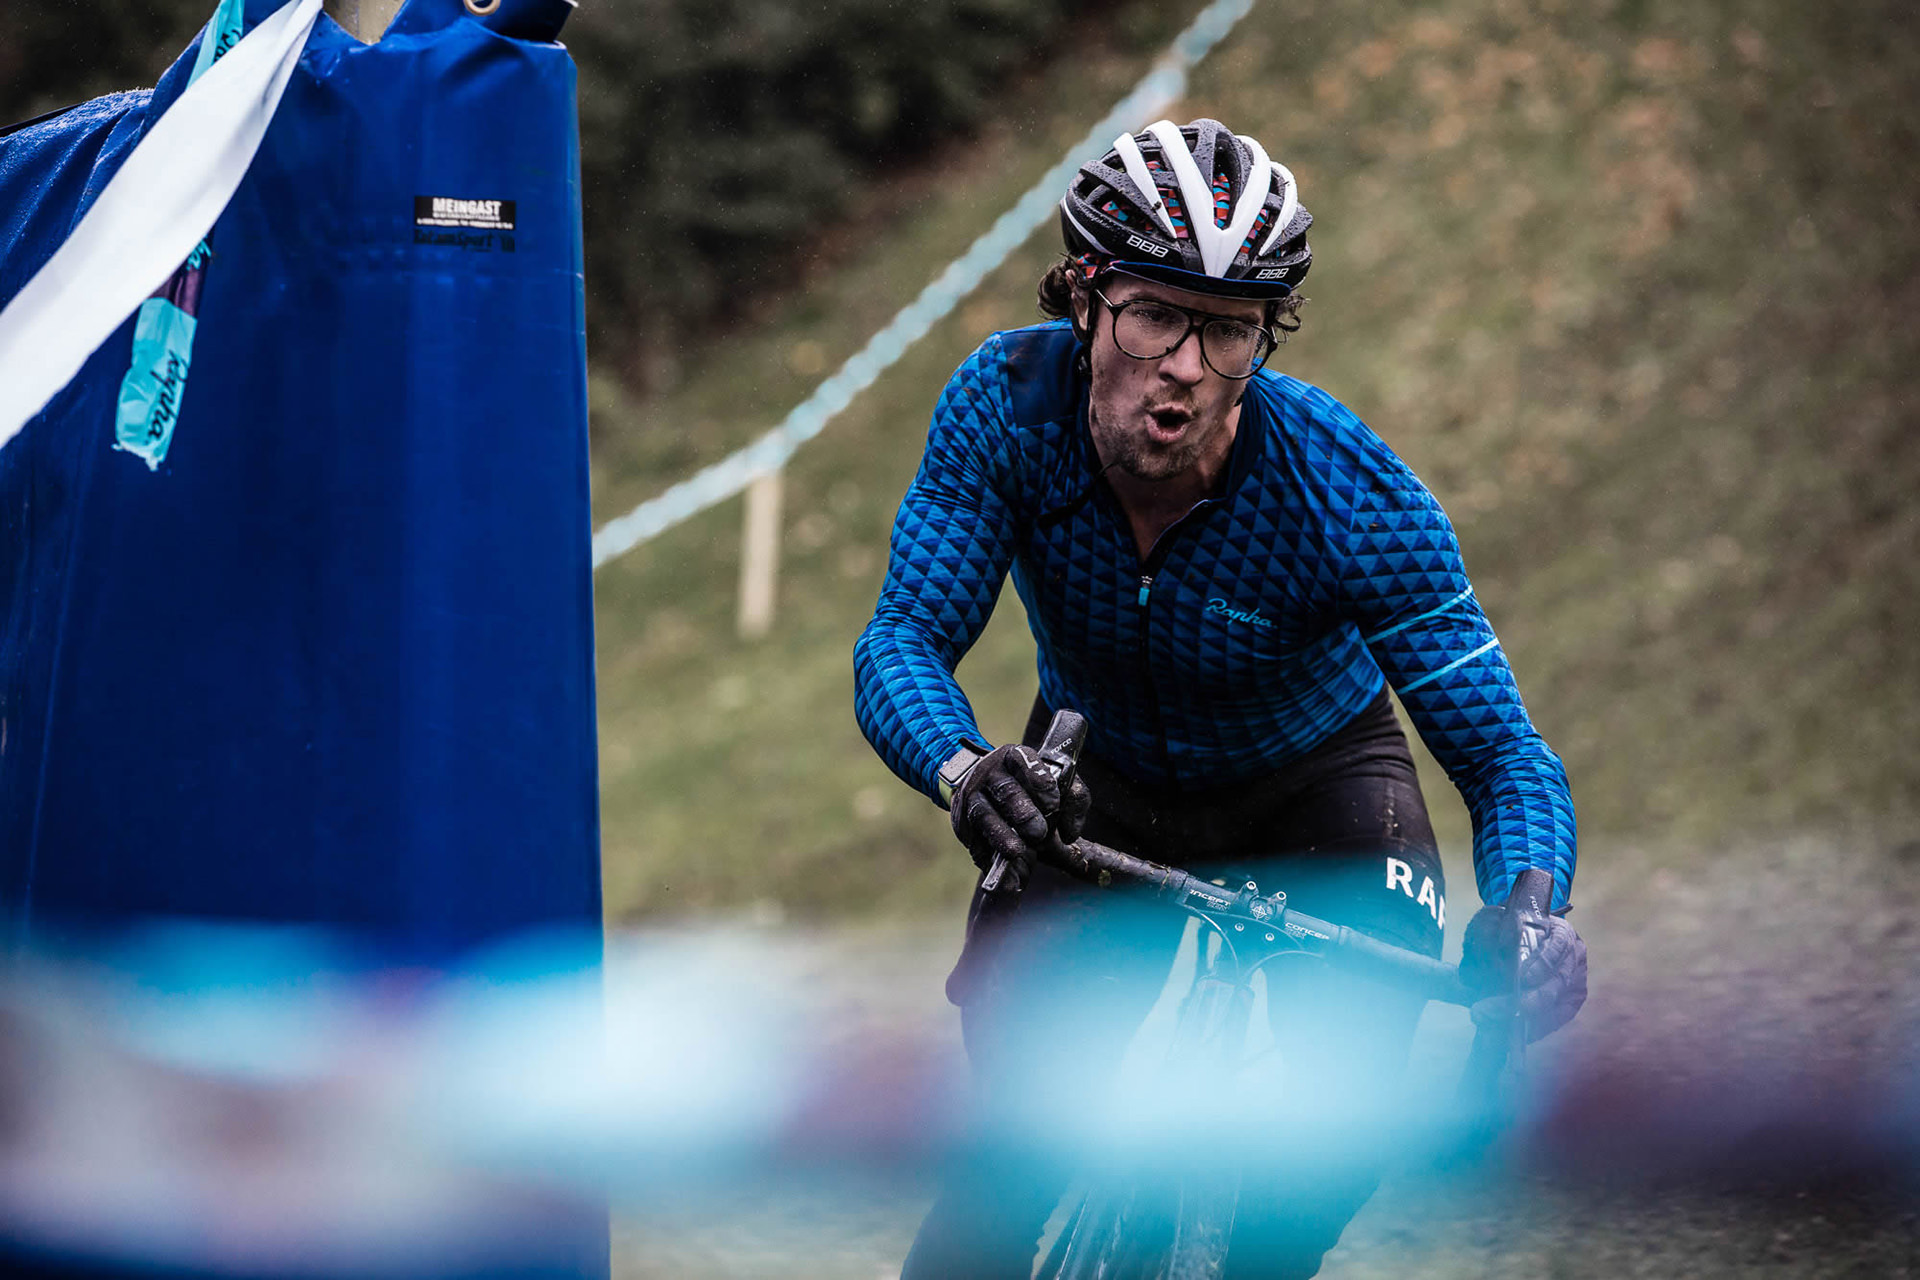 race-bike-hill-concentration-man